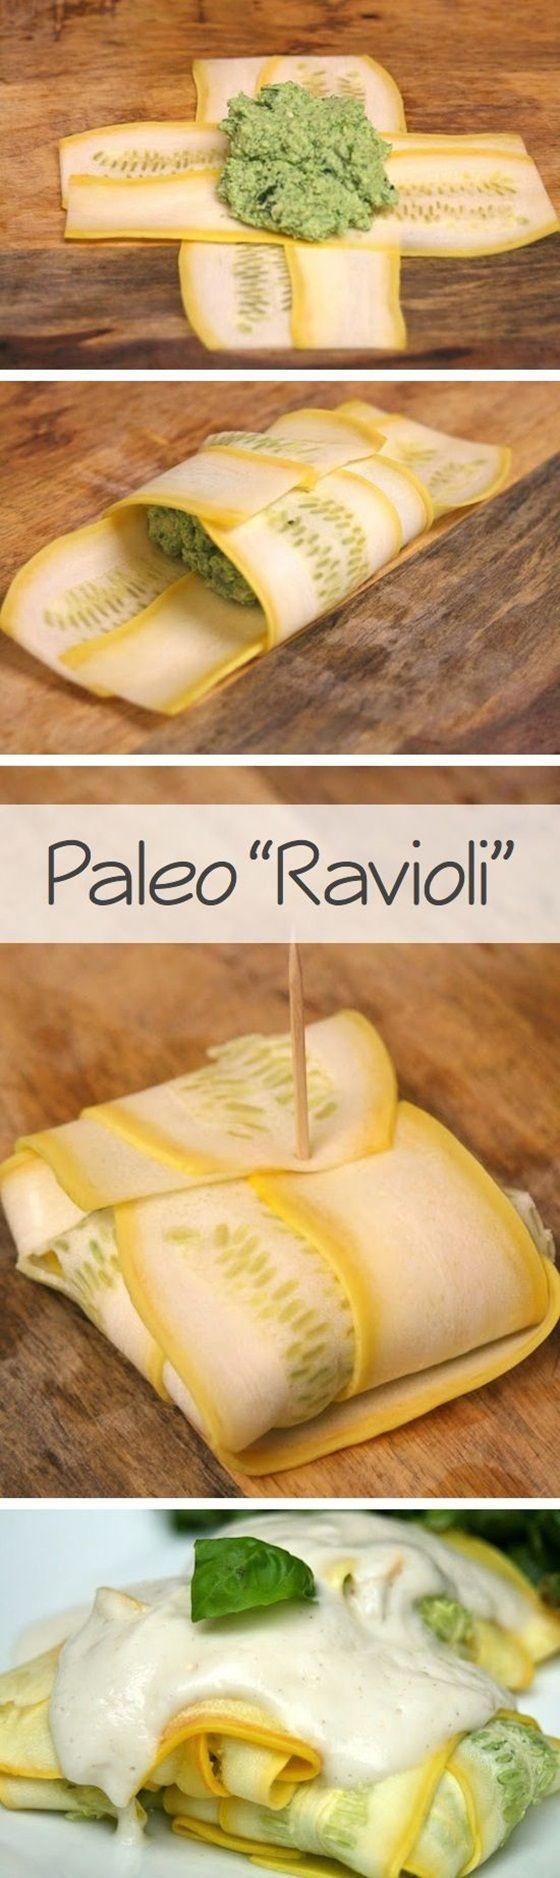 "Paleo Veggie ""Ravioli"" #paleo #glutenfree #cleaneating"